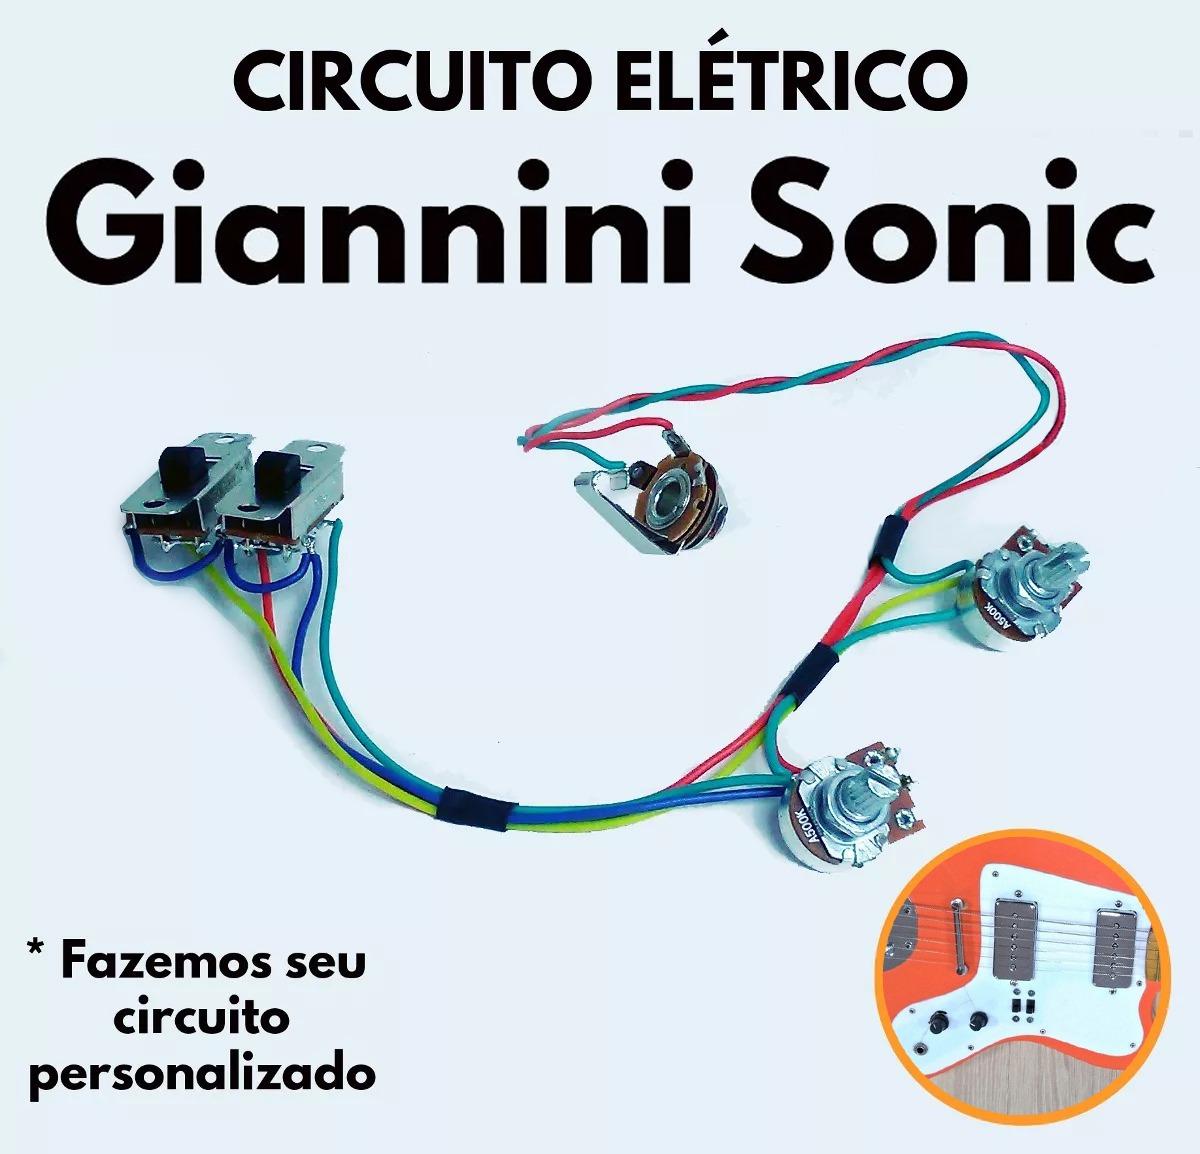 Circuito Eletricos : Circuito elétrico guitarra giannini sonic antiga r em